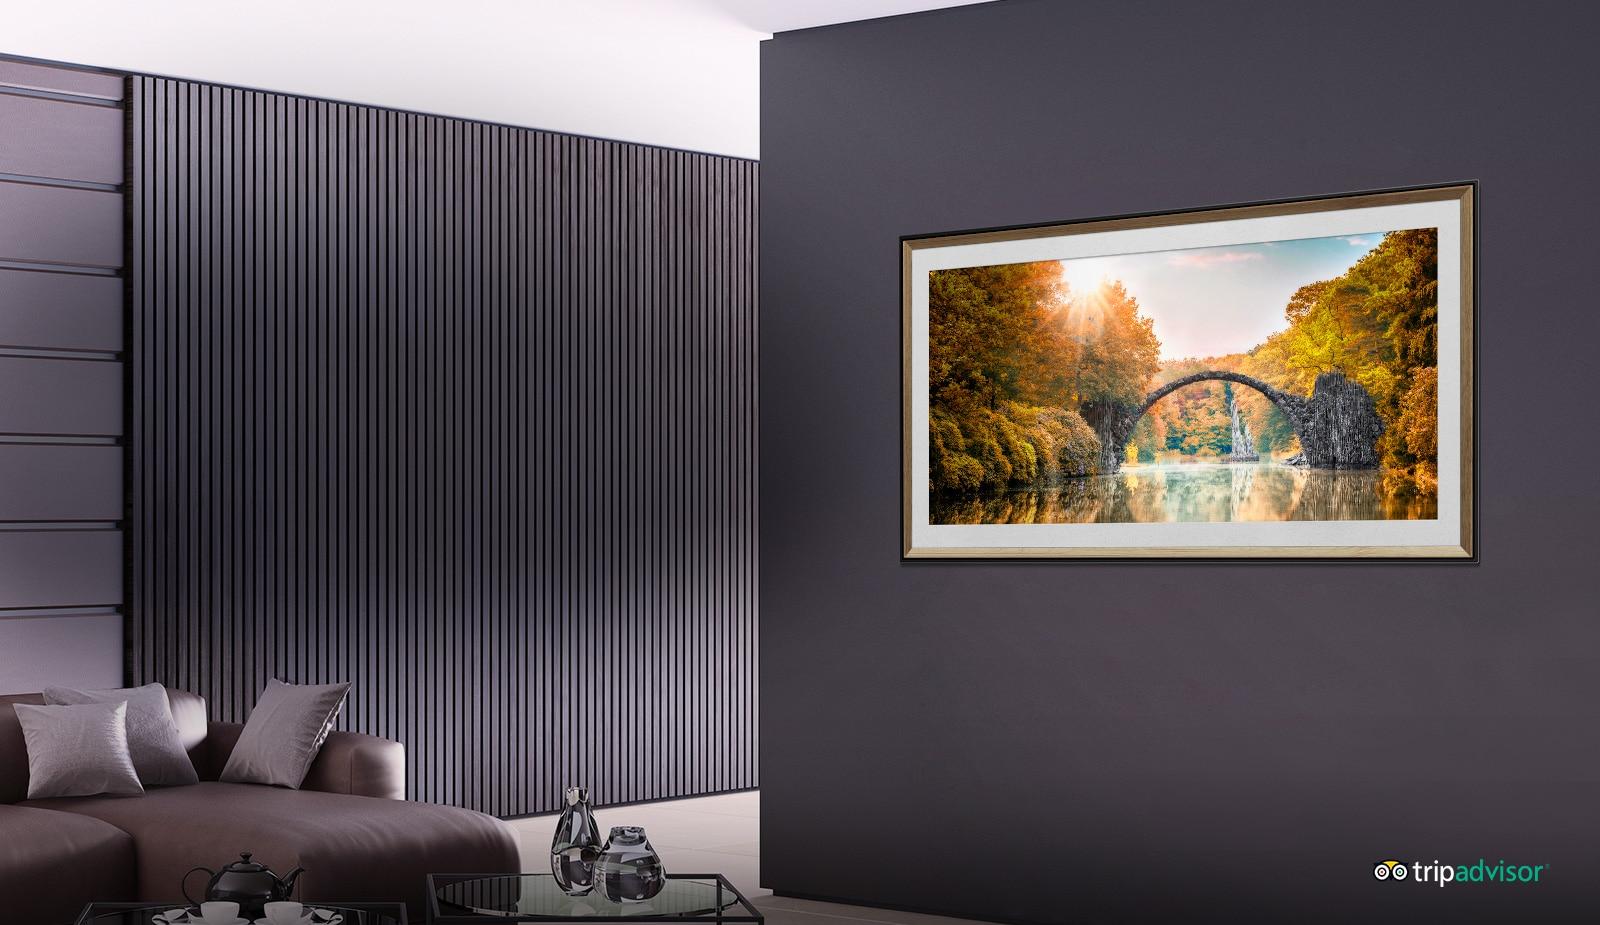 TV-OLED-E9-A-07-Gallery-Mode-Desktop